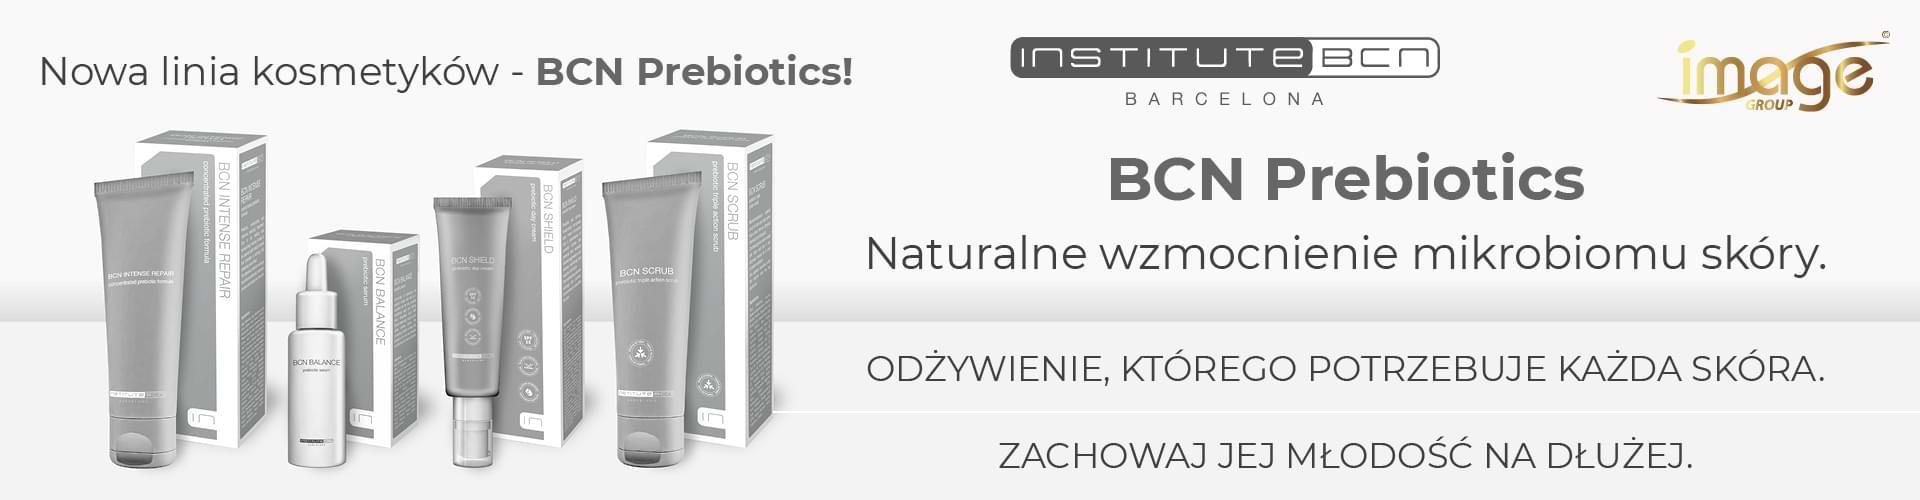 baner_www_Prebiotics